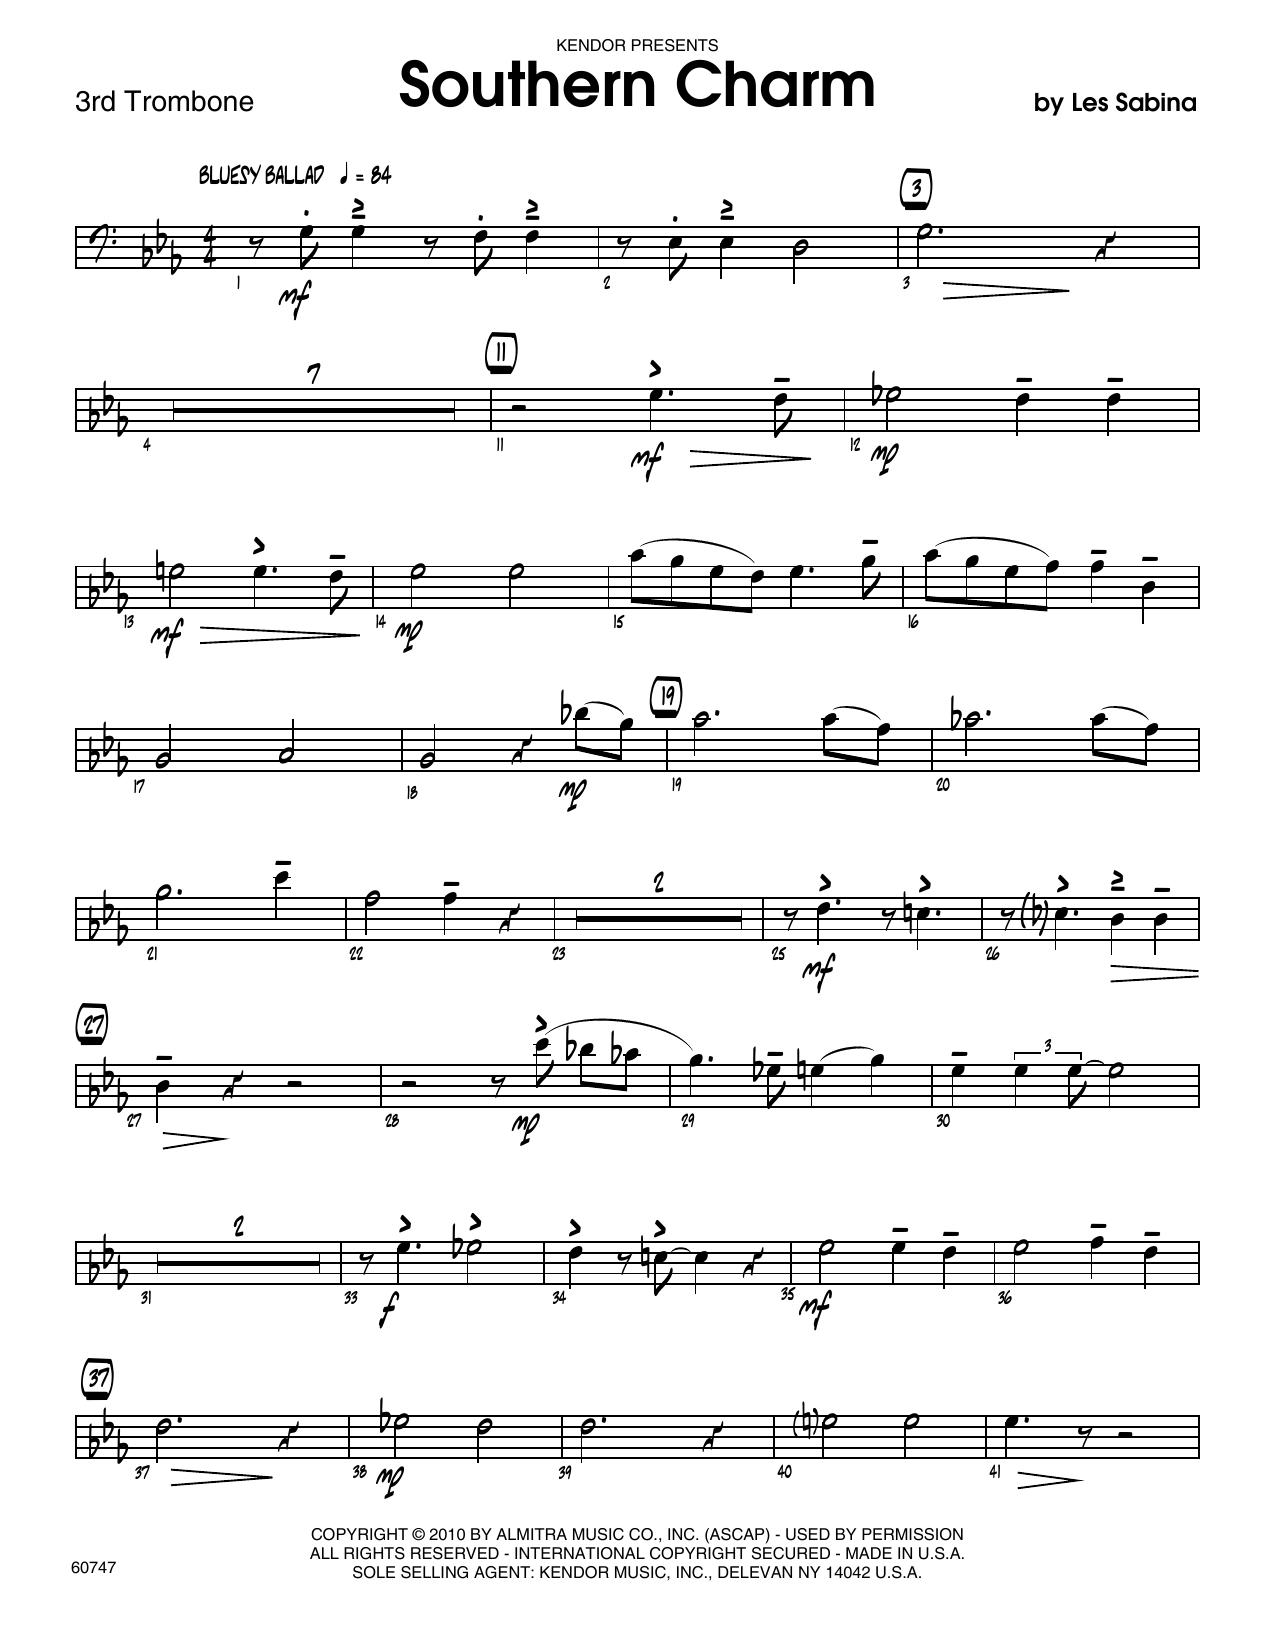 Southern Charm - 3rd Trombone Sheet Music